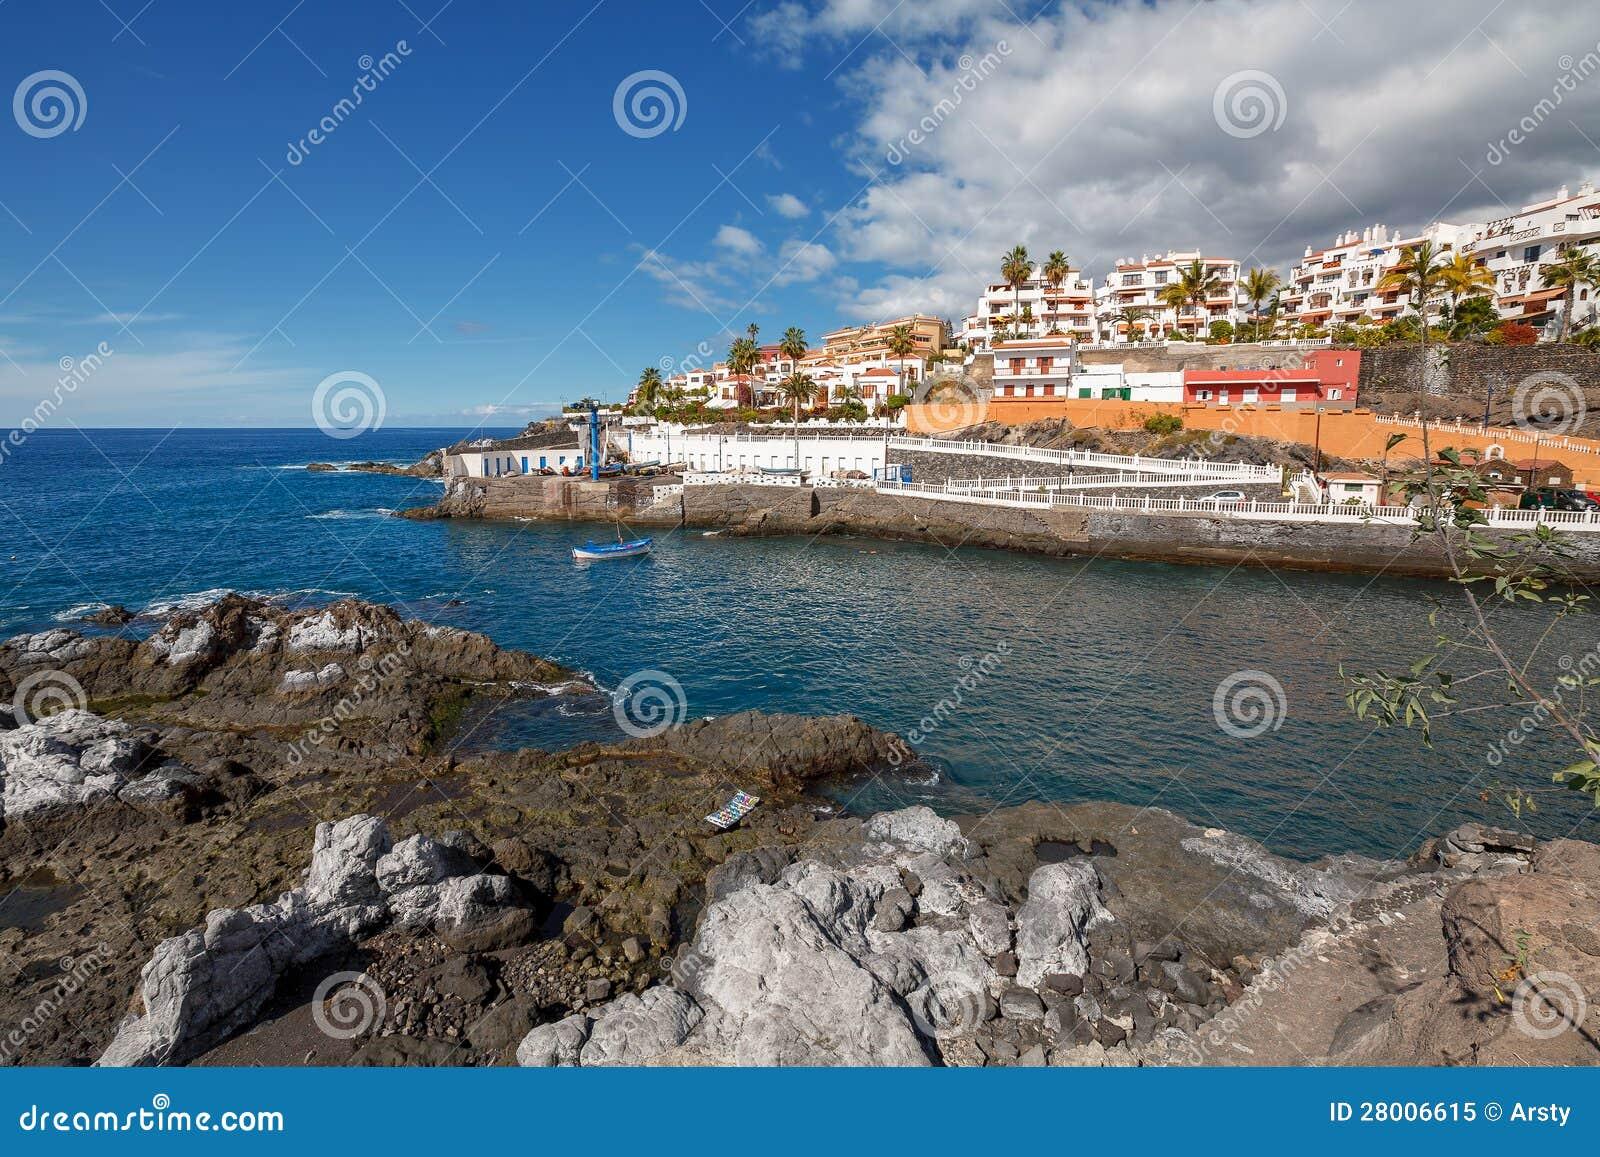 Puerto de santiago tenerife royalty free stock photo image 28006615 - Puerto santiago tenerife mapa ...